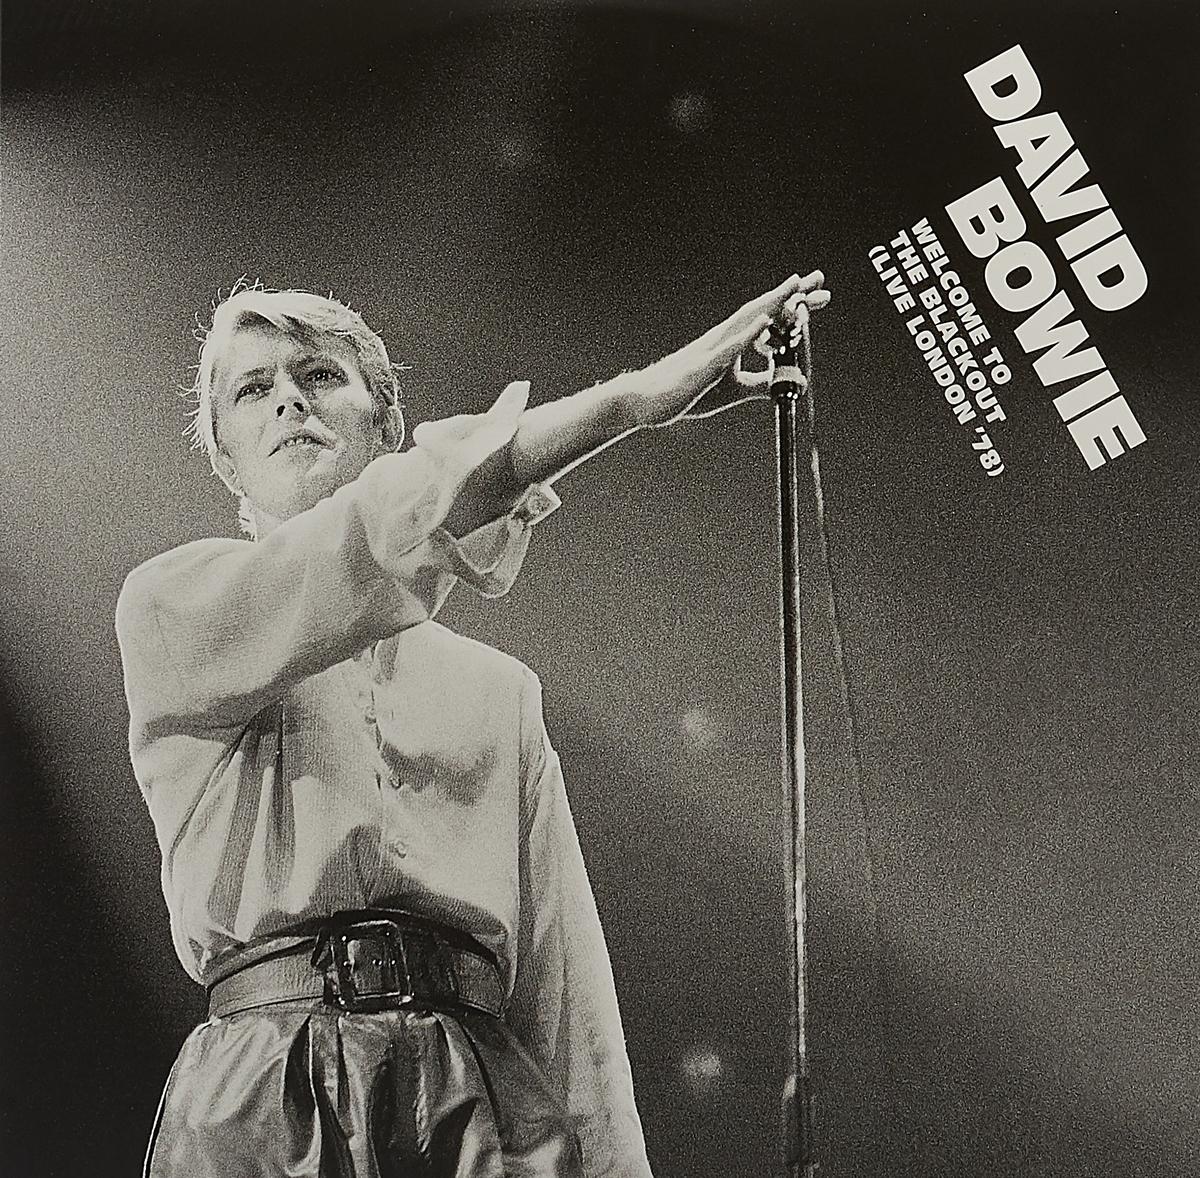 Дэвид Боуи David Bowie. Welcome To The Blackout (Live London '78) (3 LP) david bowie pinups lp